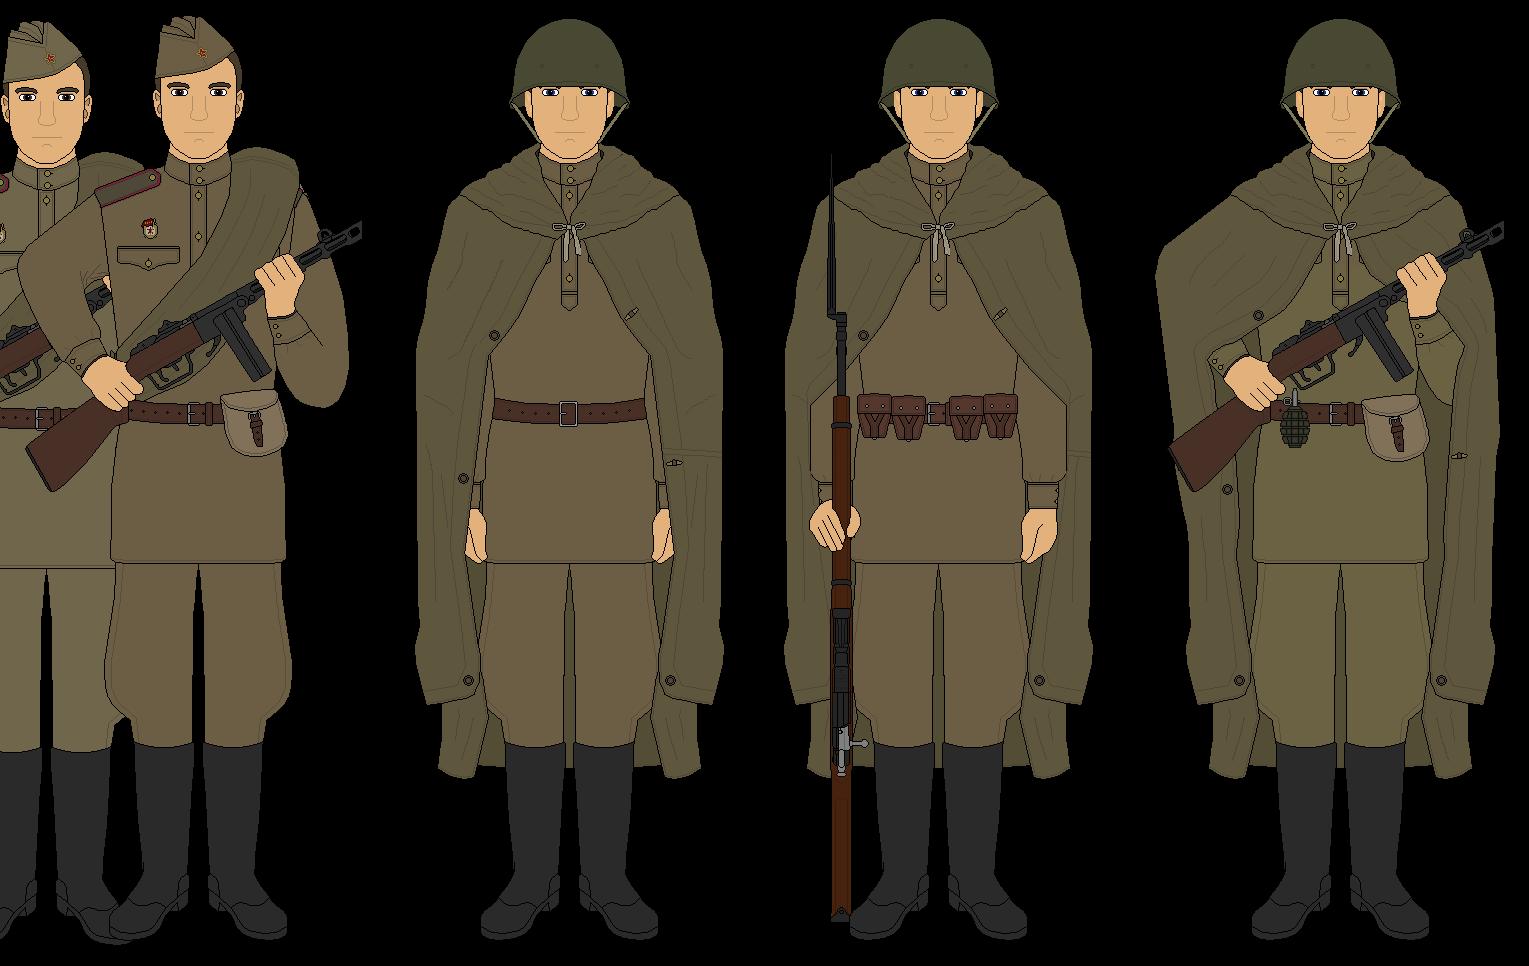 Plash-Palatka - Enlisted - Circa 1941-1945 by JoeyLock on ...